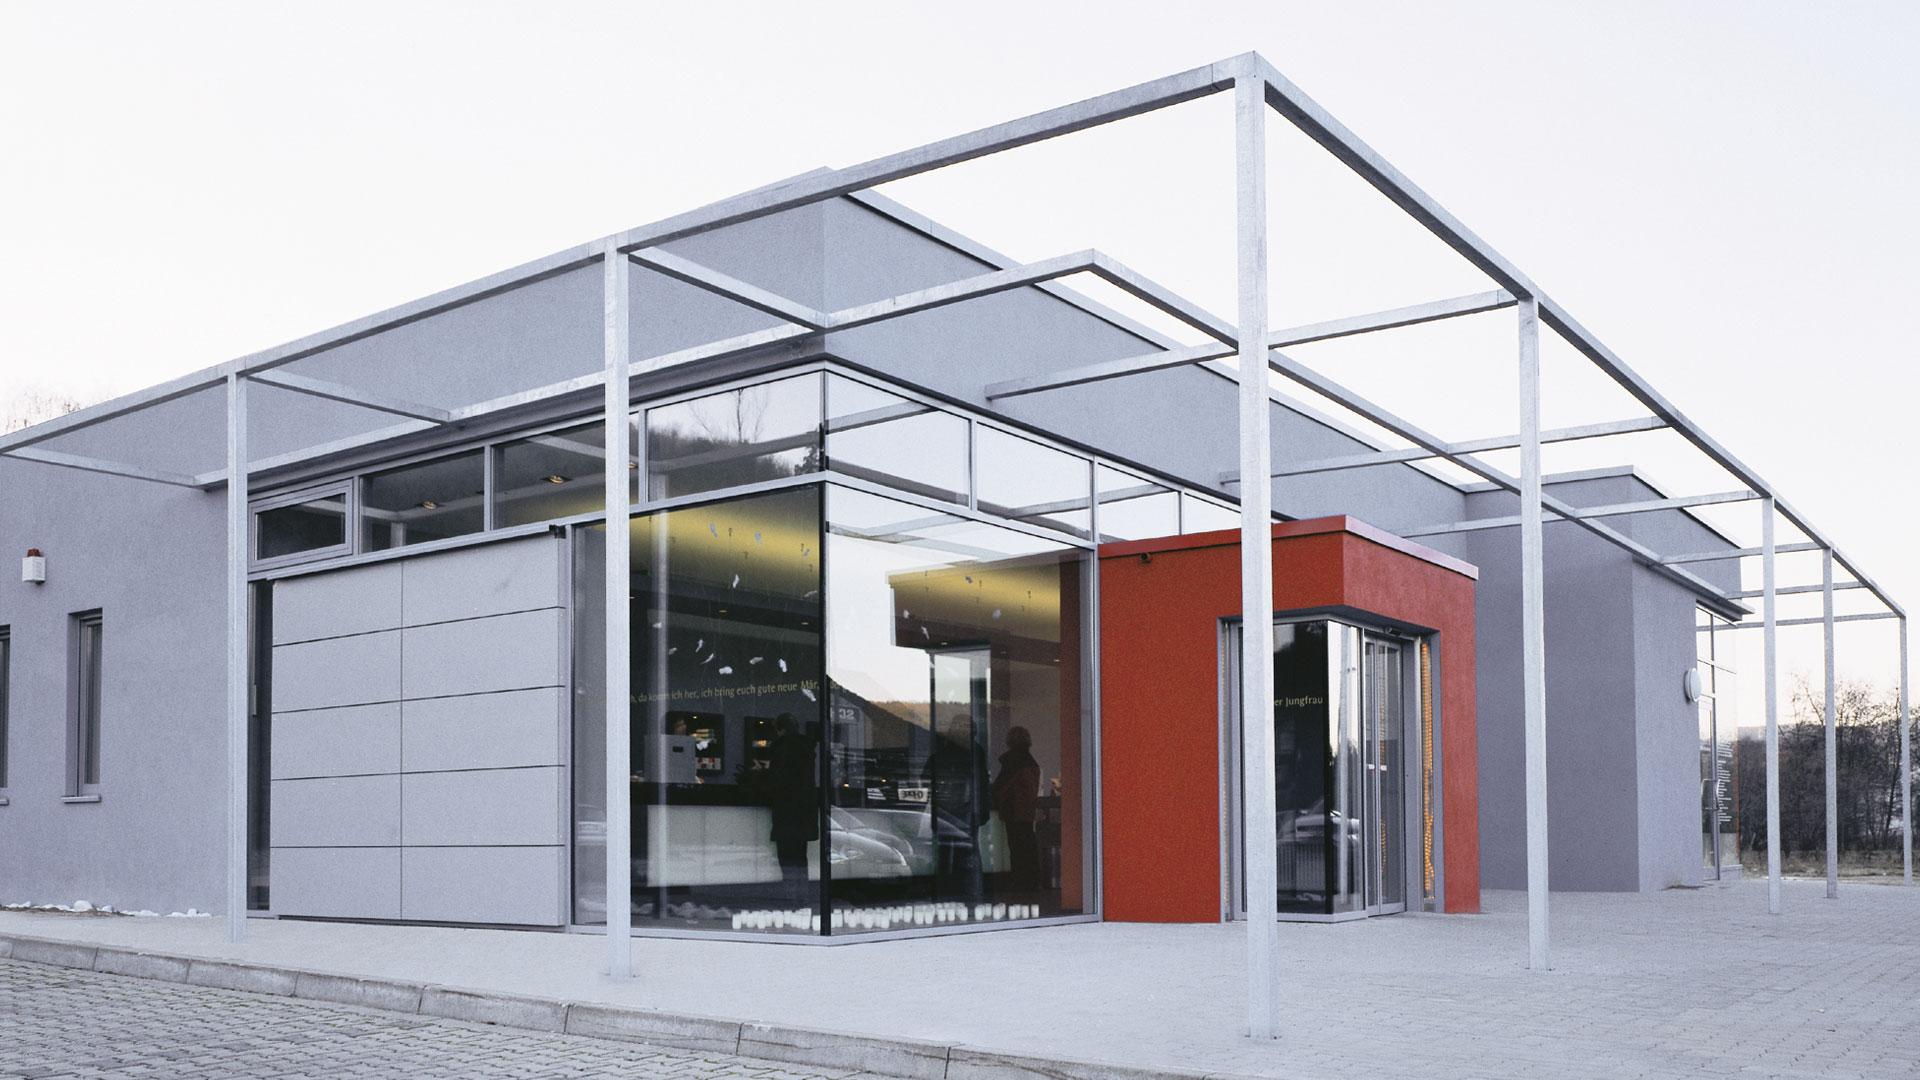 Neubau Deuzer Apotheke, Innenarchitektur, Ladenbau, Musahl Architektur, Waldshut